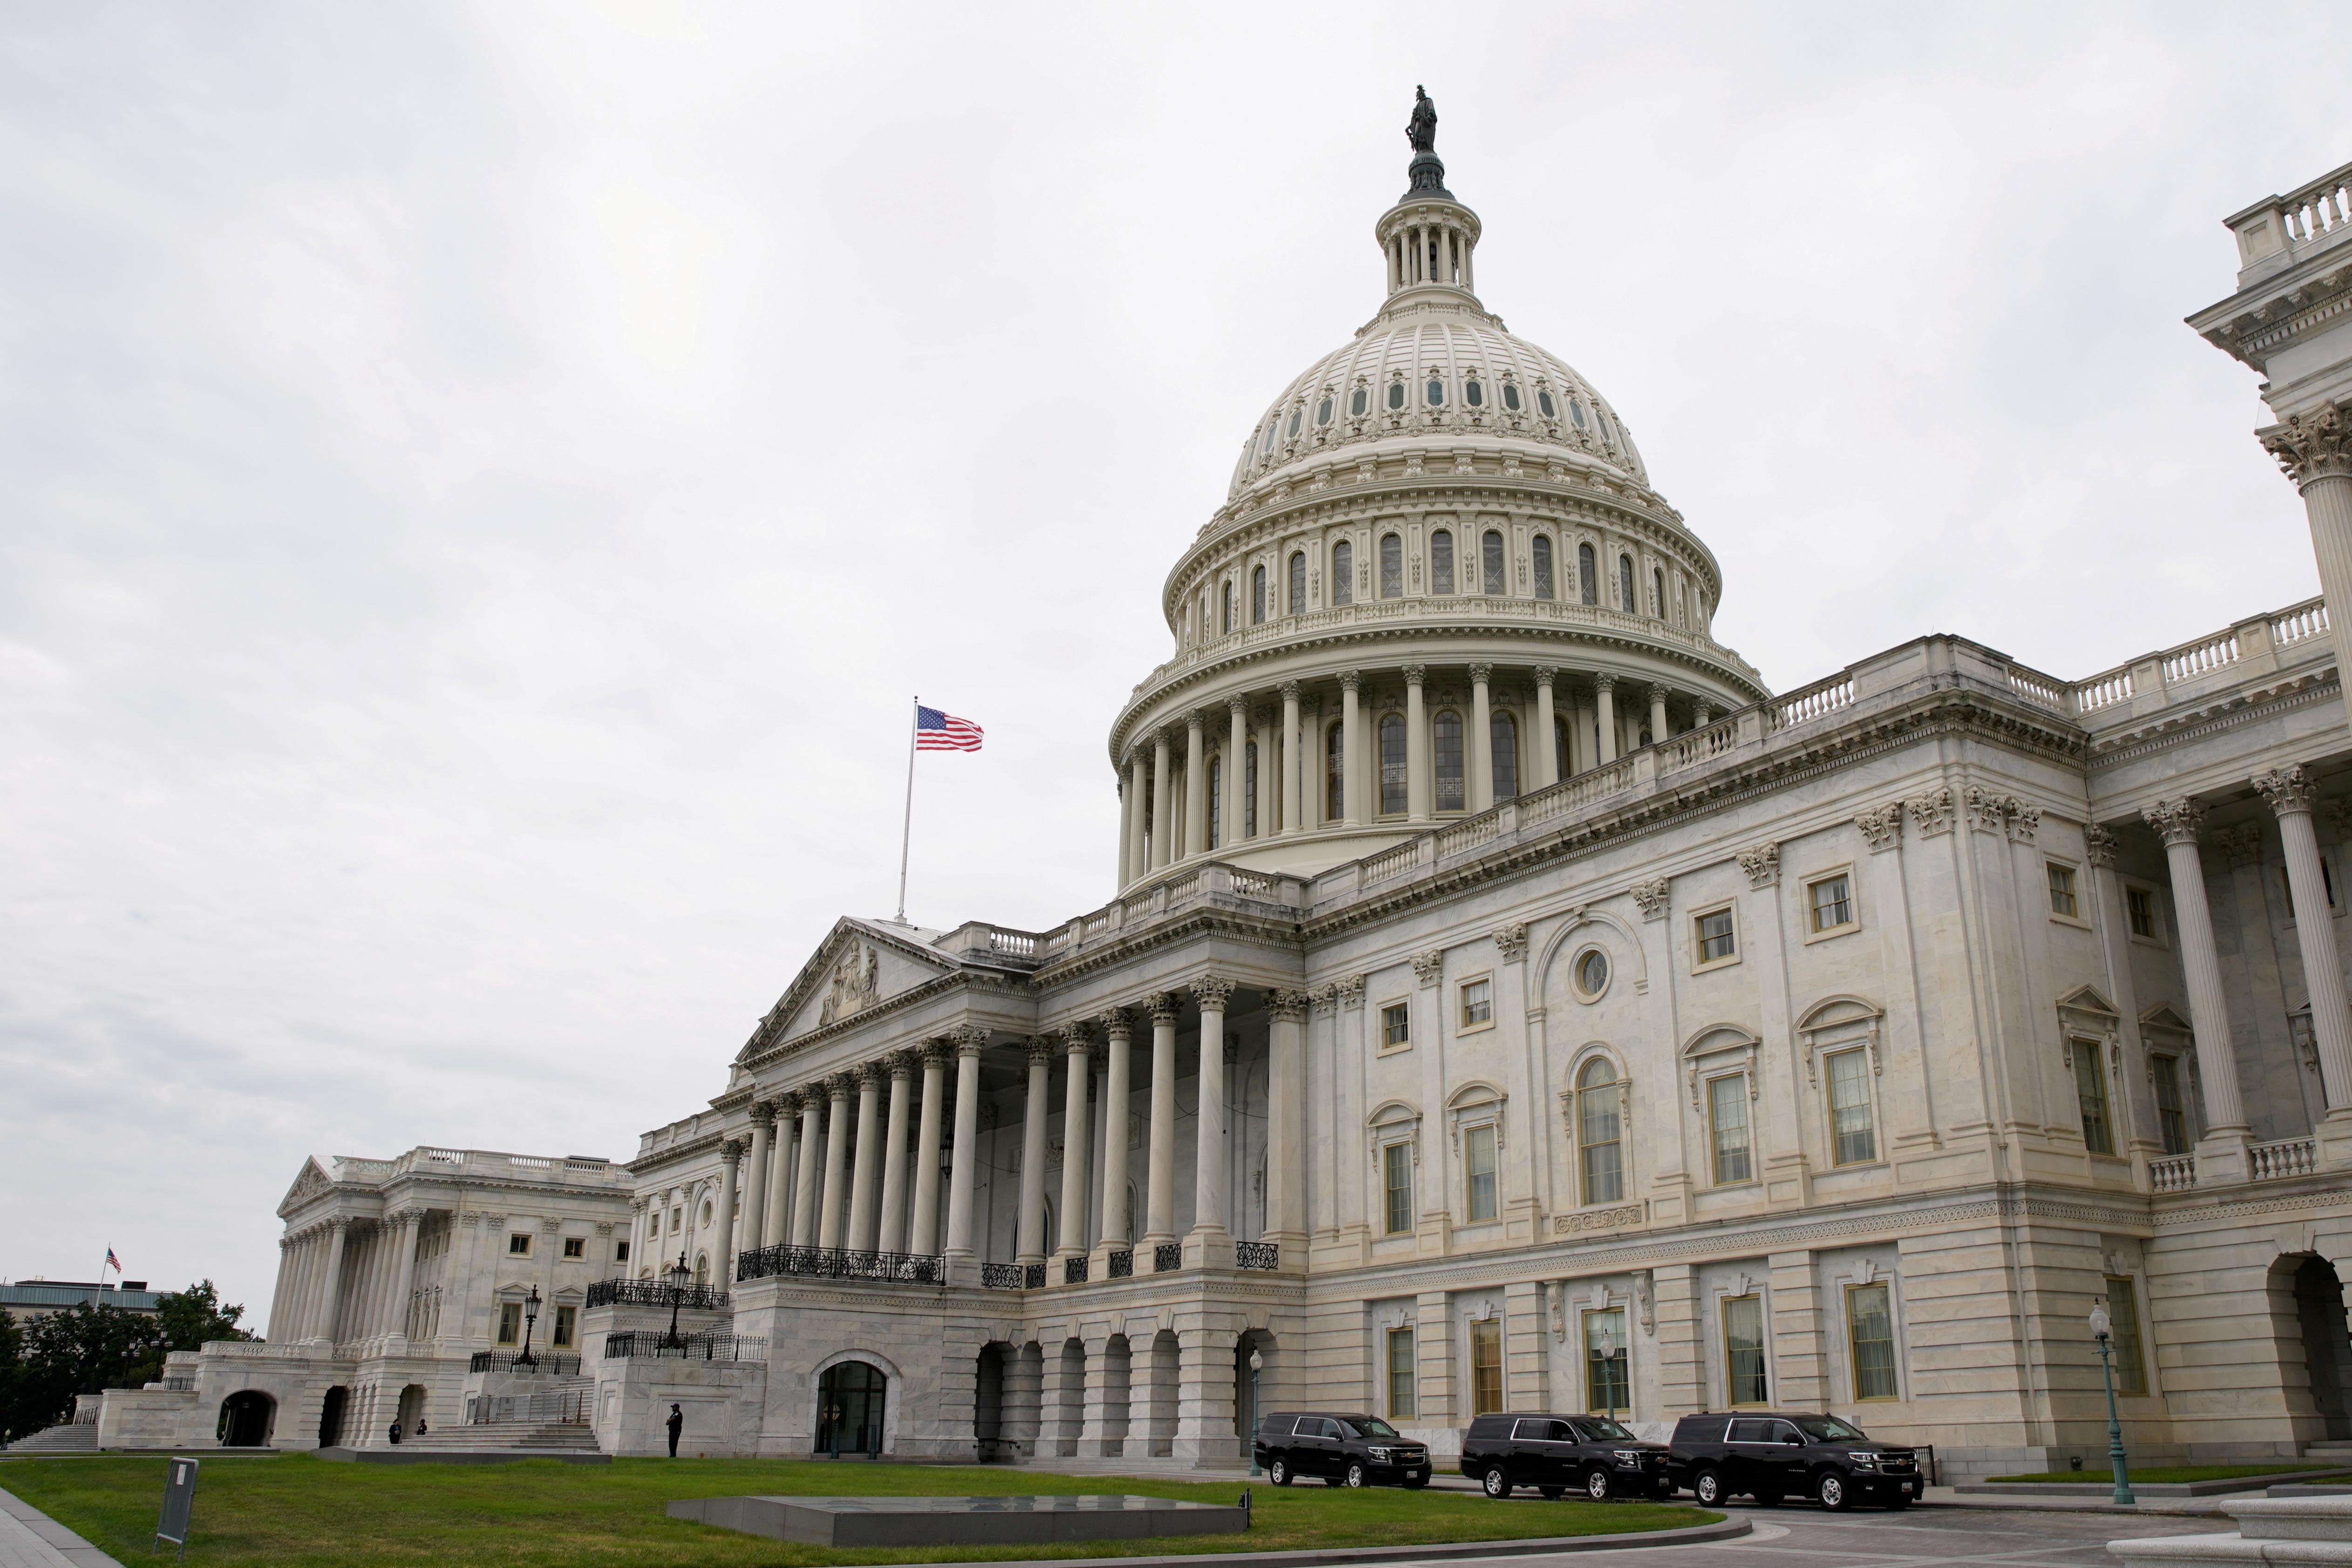 U.S. senators make final tweaks to infrastructure bill, expect passage this week